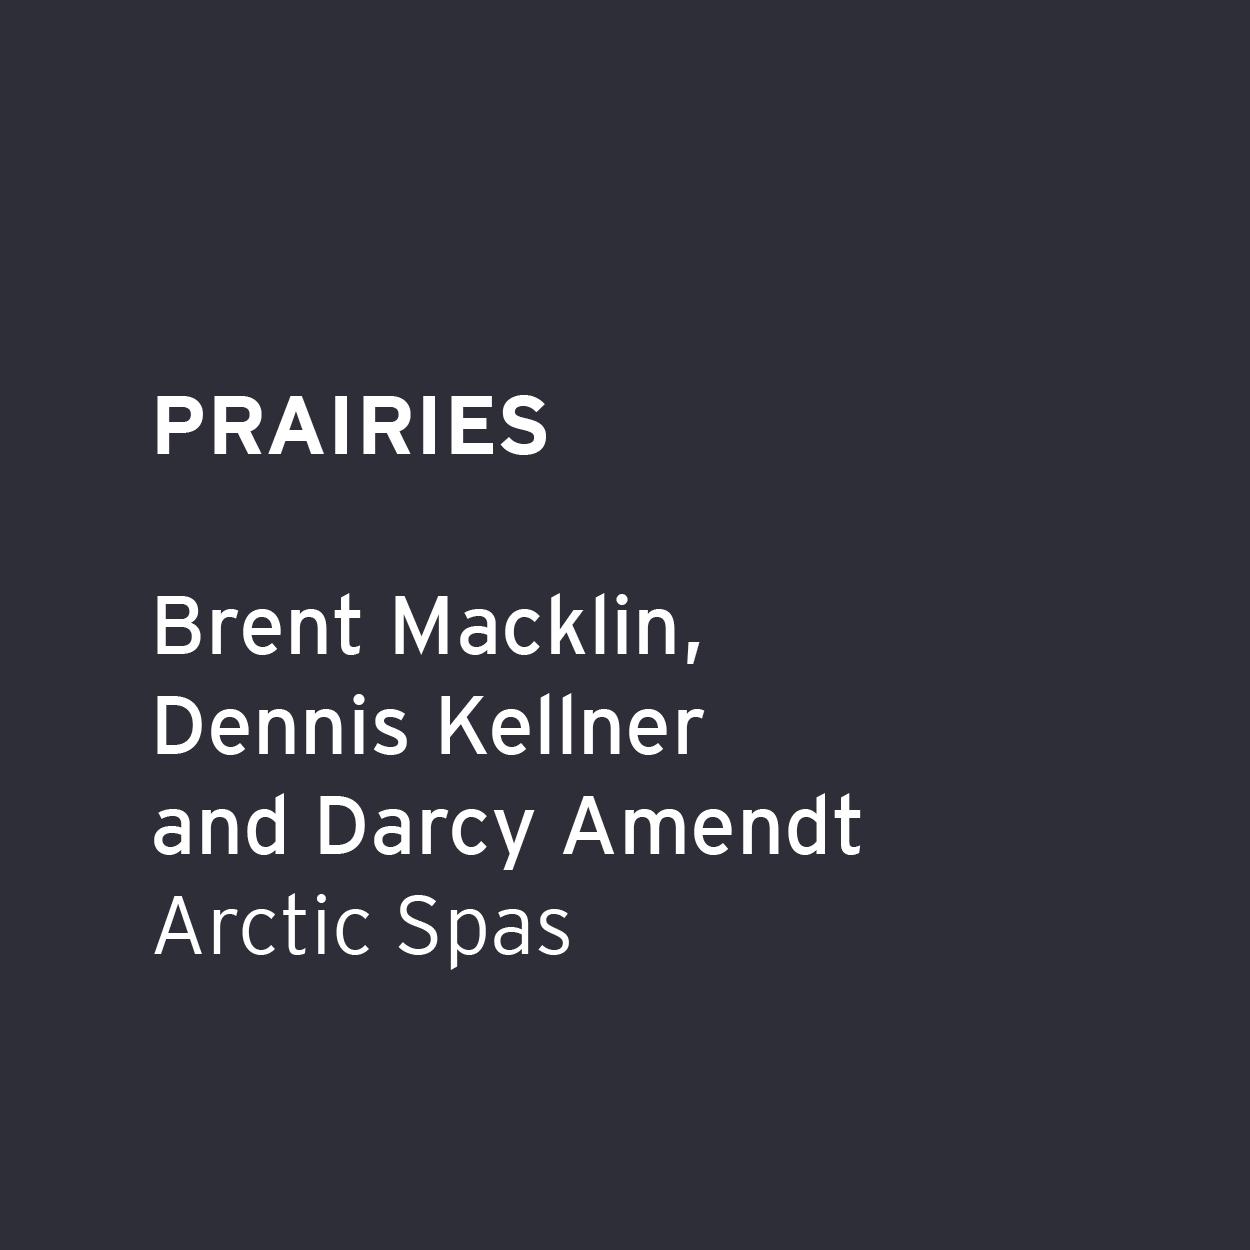 Brent Macklin, Dennis Kellner and Darcy Amendt - Arctic Spas